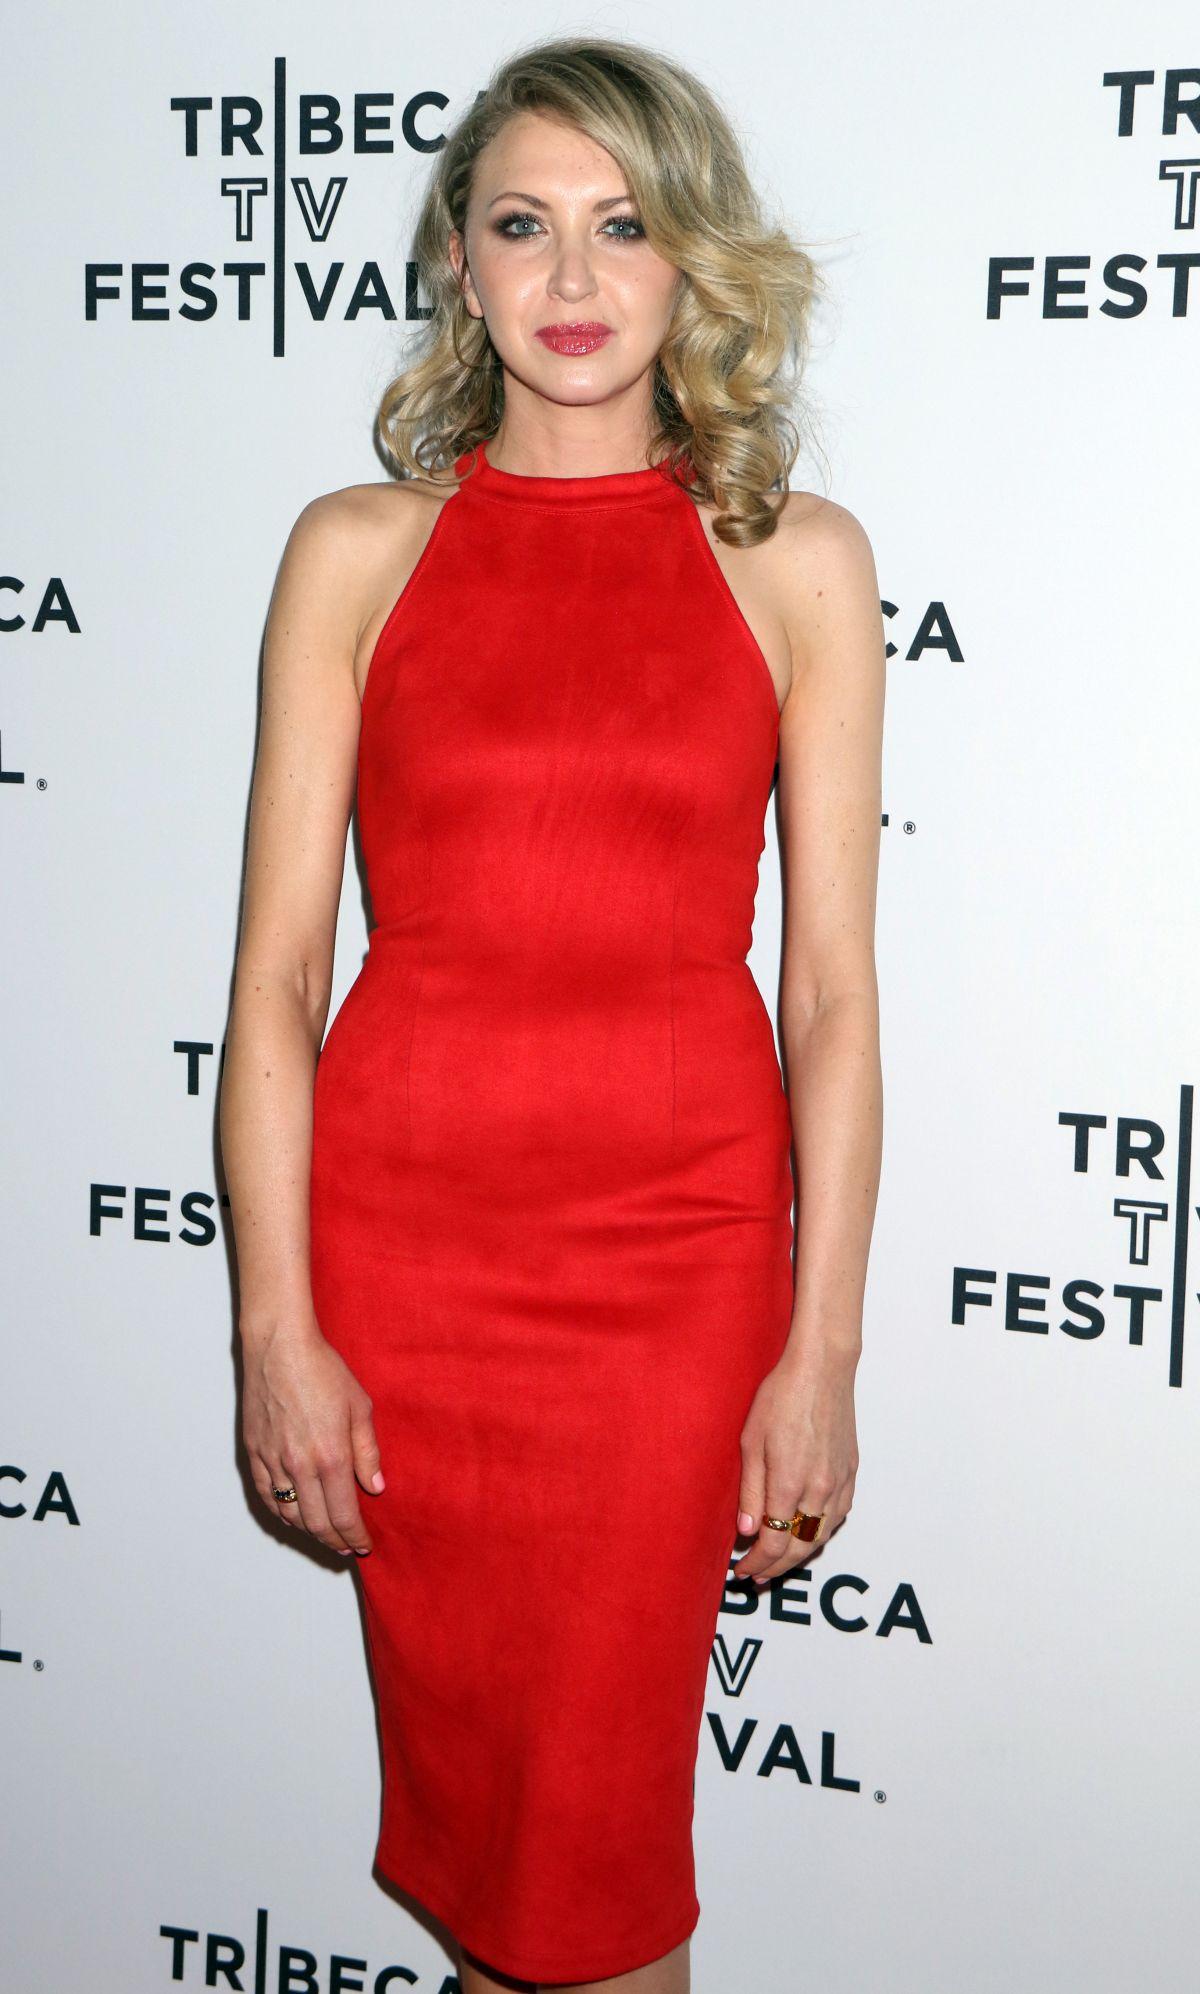 NINA ARIANDA at Goliath Screening at Tribeca TV Festival